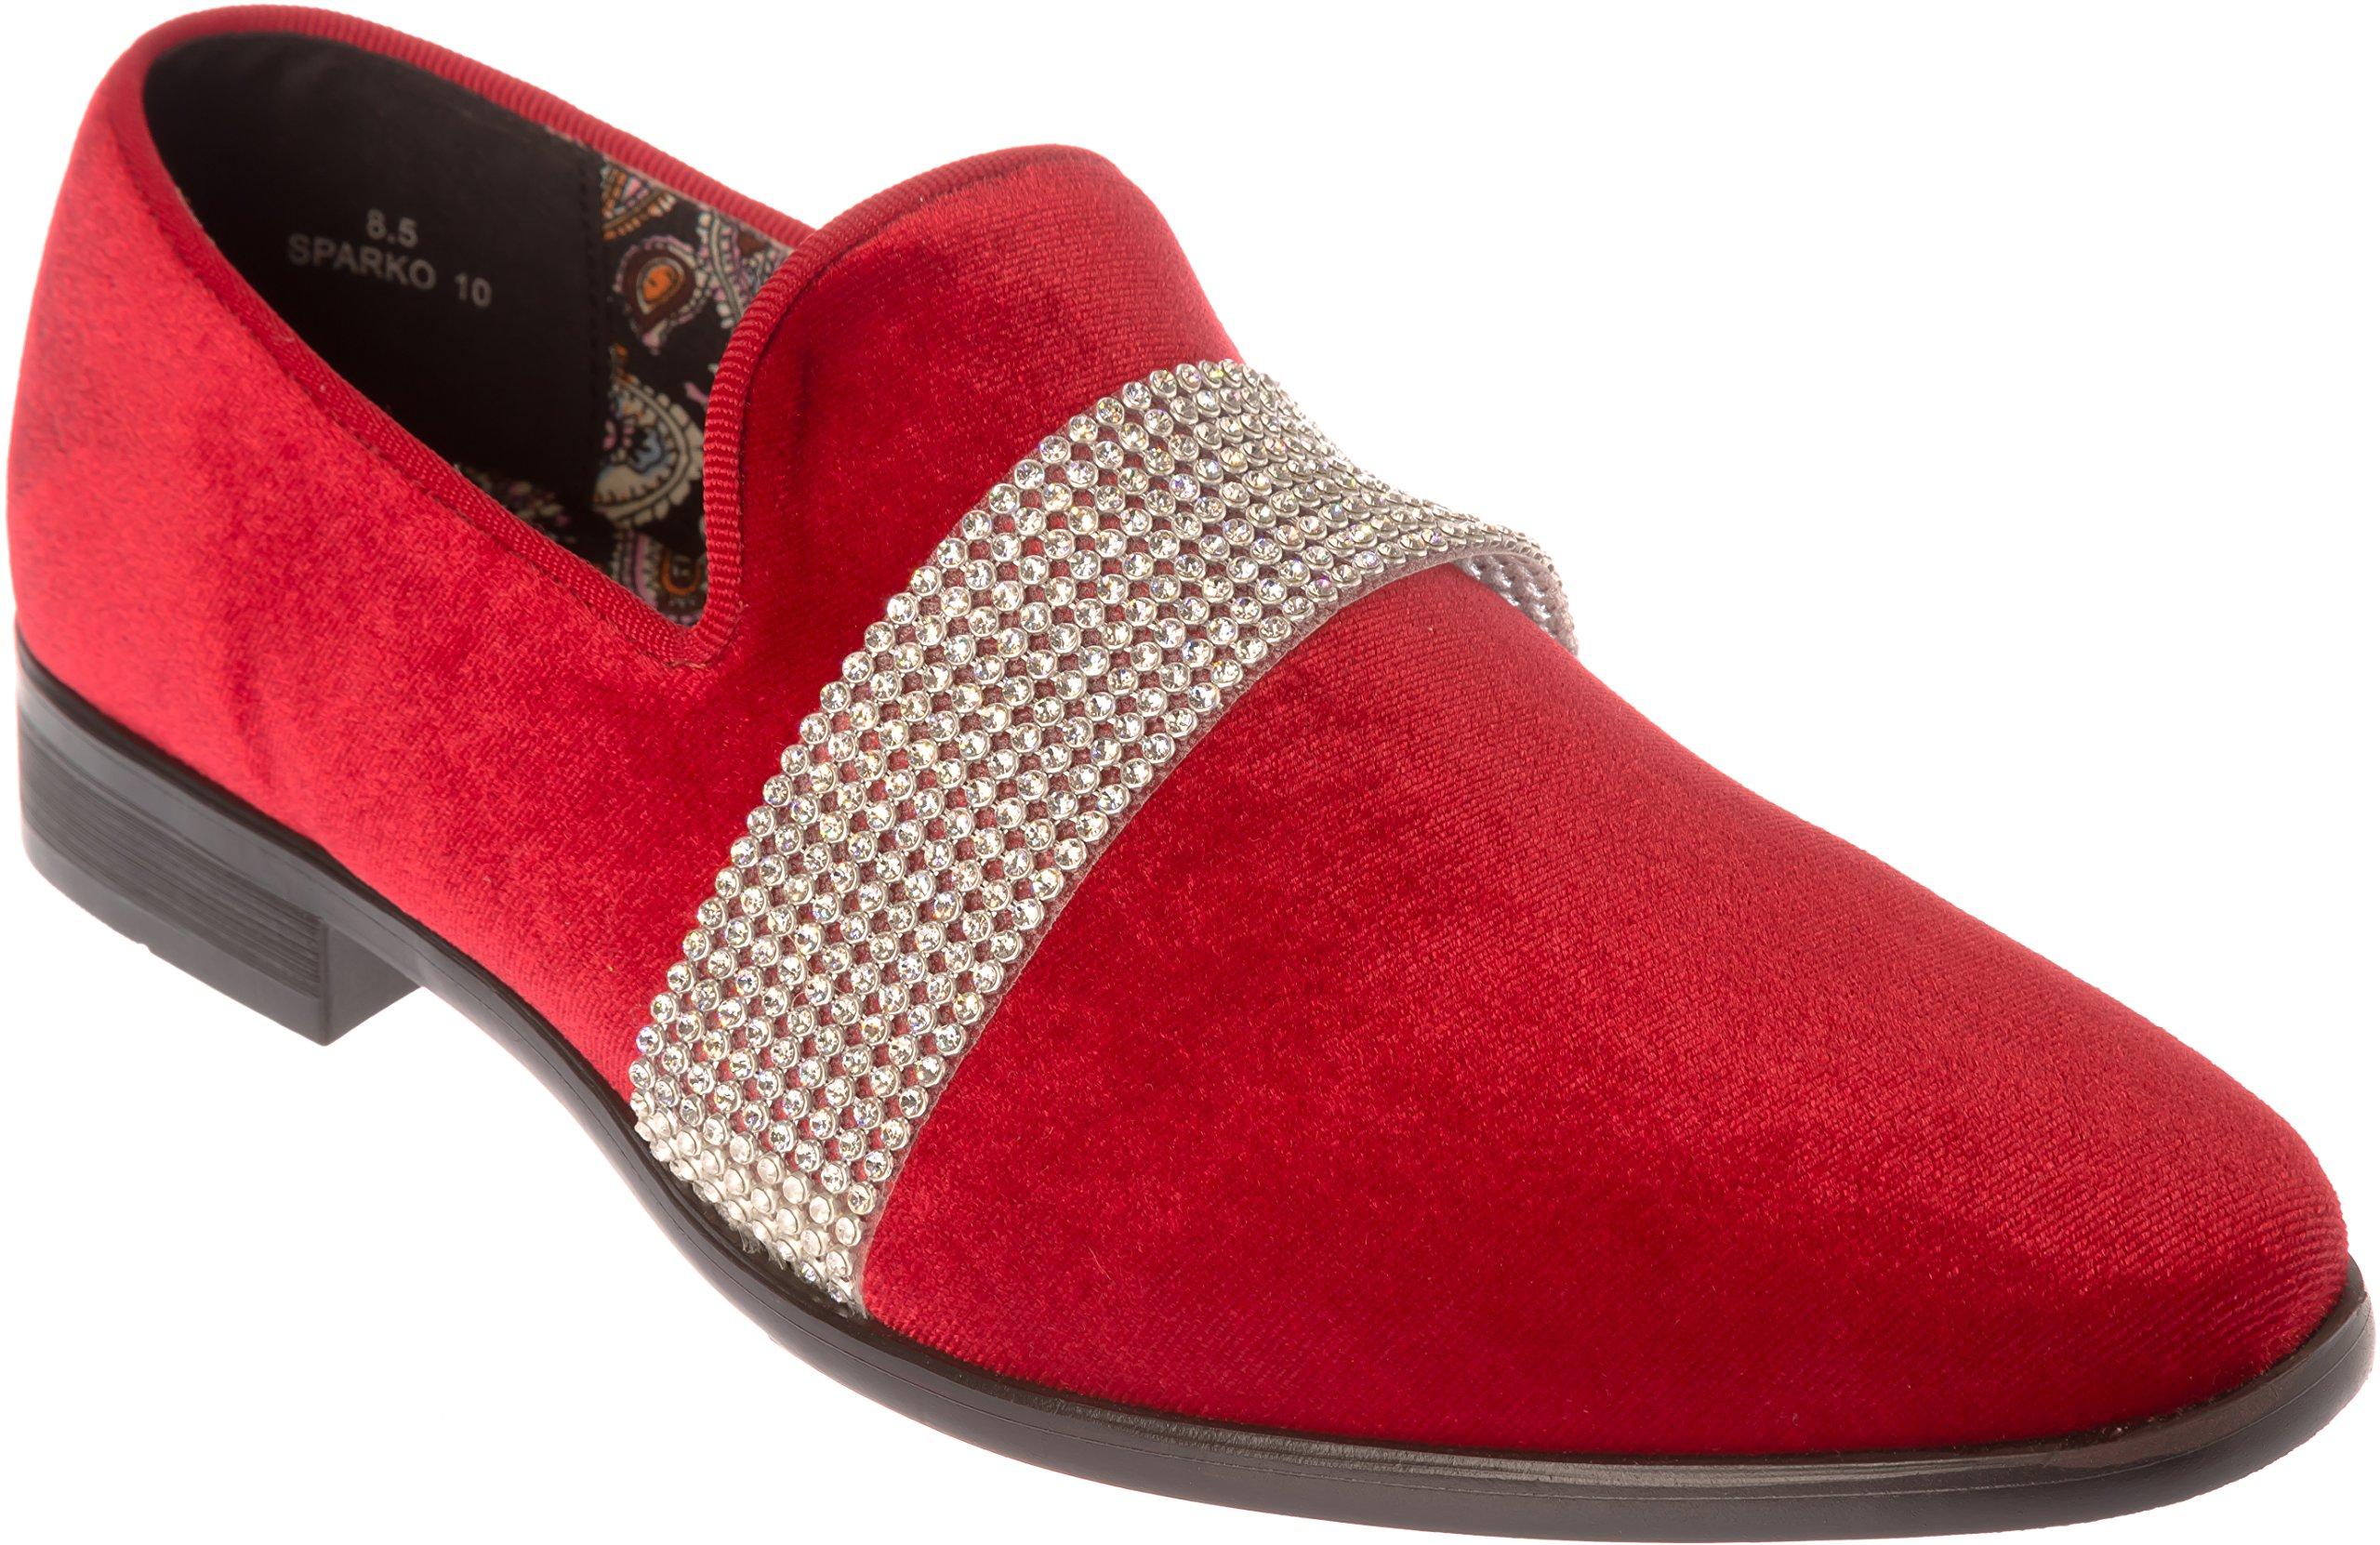 Shoes Picker sparko10 Mens Slip-On Fashion-Loafer Sparkling-Glitter Red Dress-Shoes Size 9